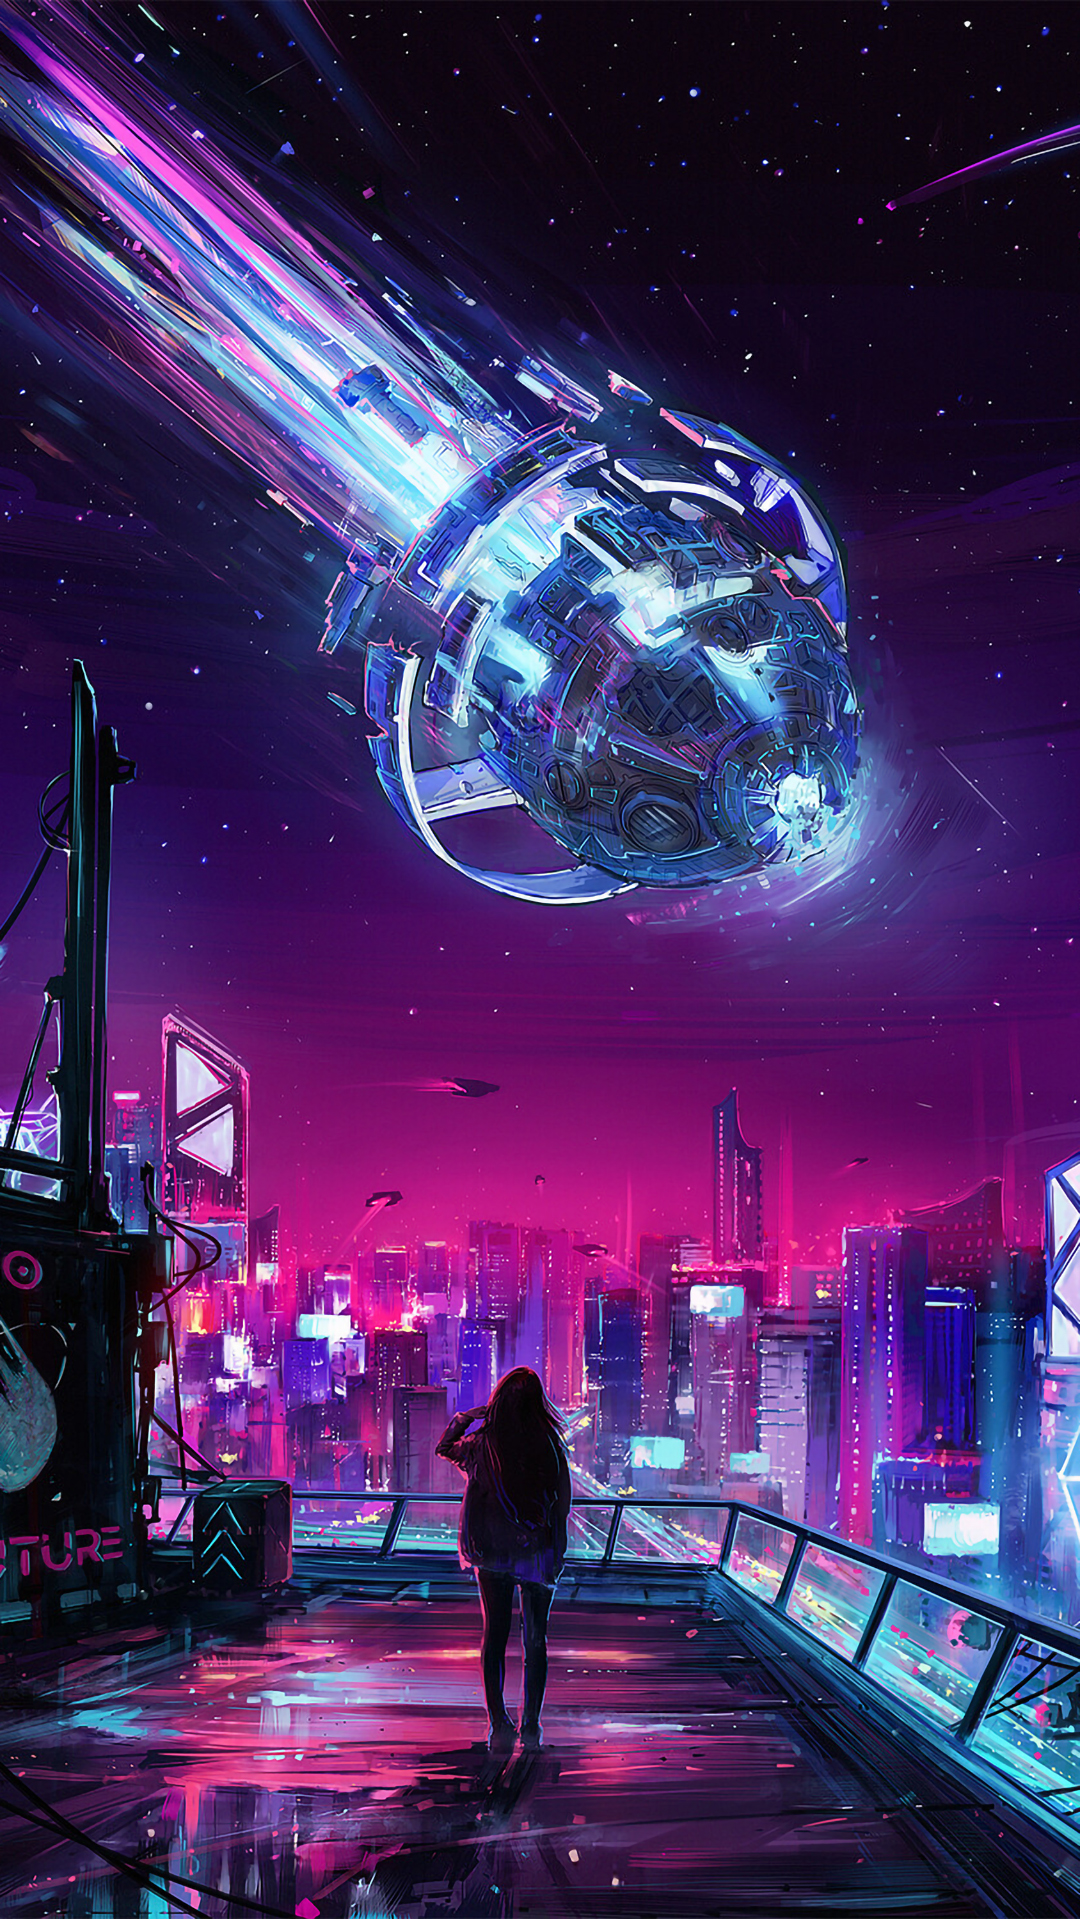 Aesthetic Cyberpunk Wallpapers - Wallpaper Cave